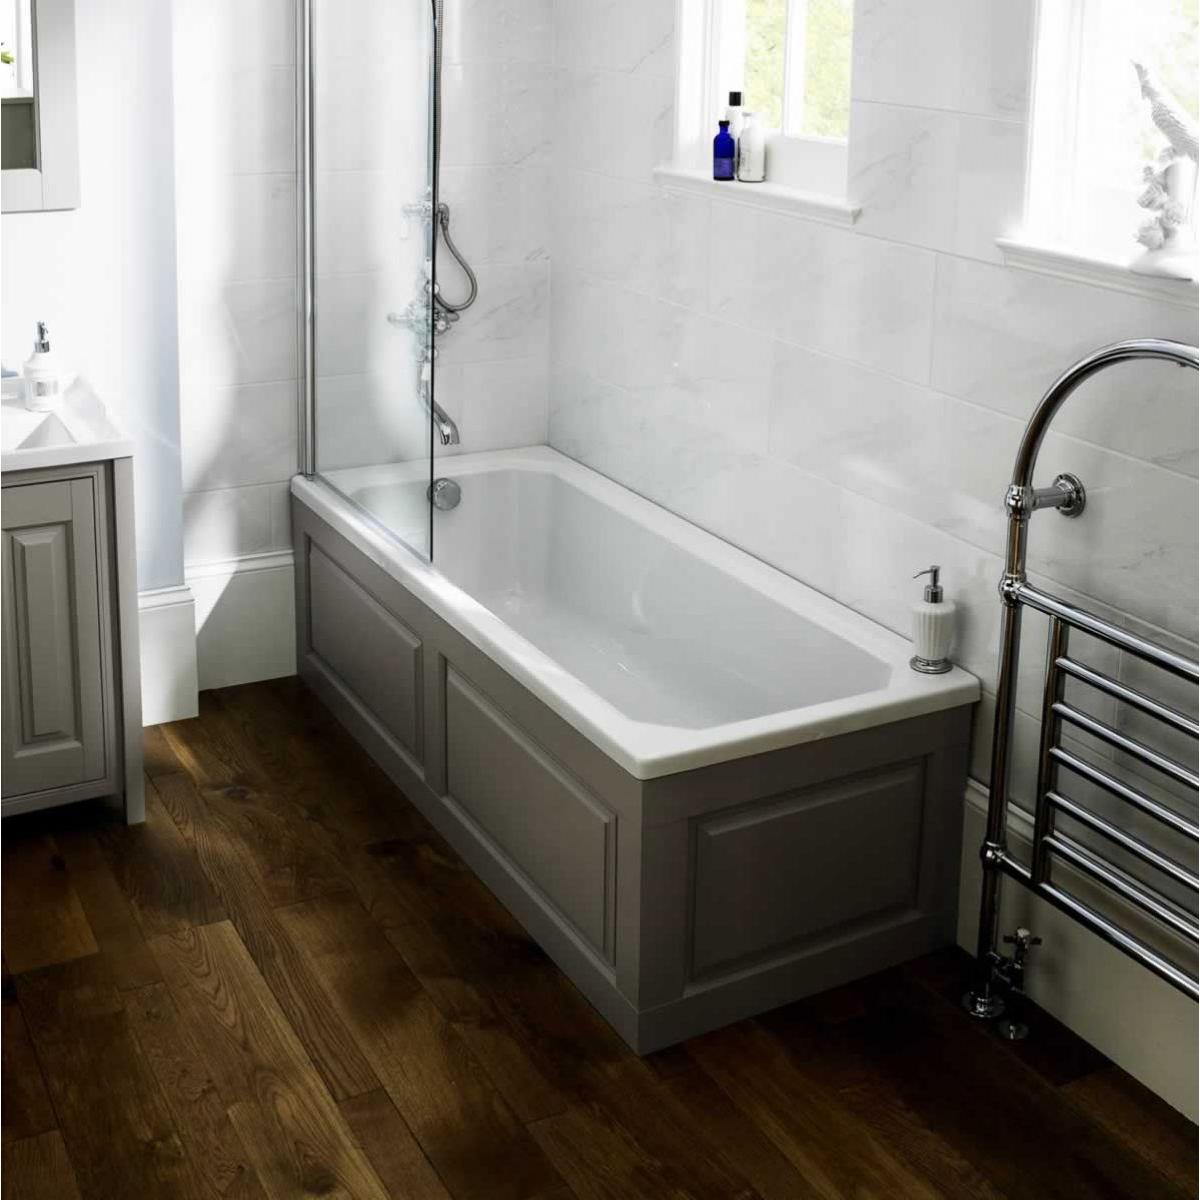 Premier Ascott Double Ended Rectangular Bath 1800mm x 800mm 0 Tap Hole